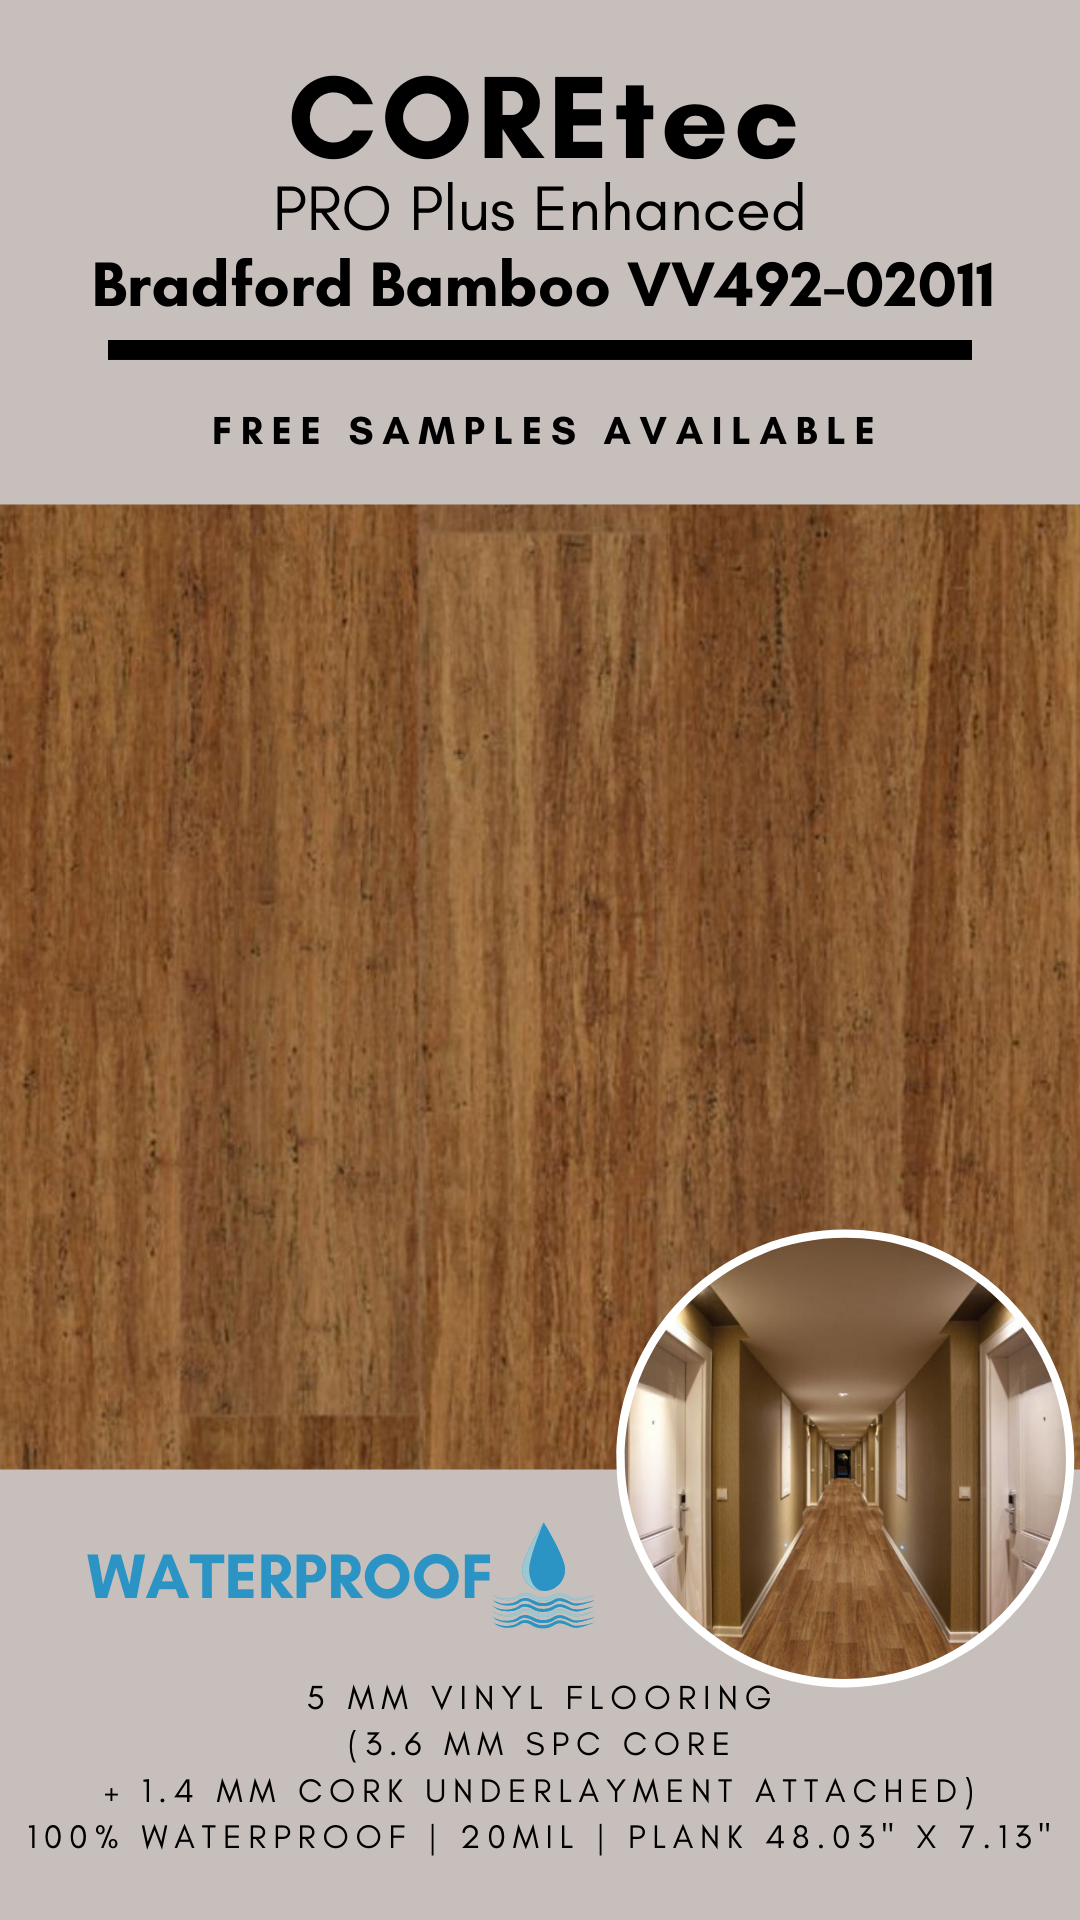 Coretec Pro Plus Enhanced Bradford Bamboo Vinyl Flooring In 2020 Vinyl Flooring Flooring Bamboo